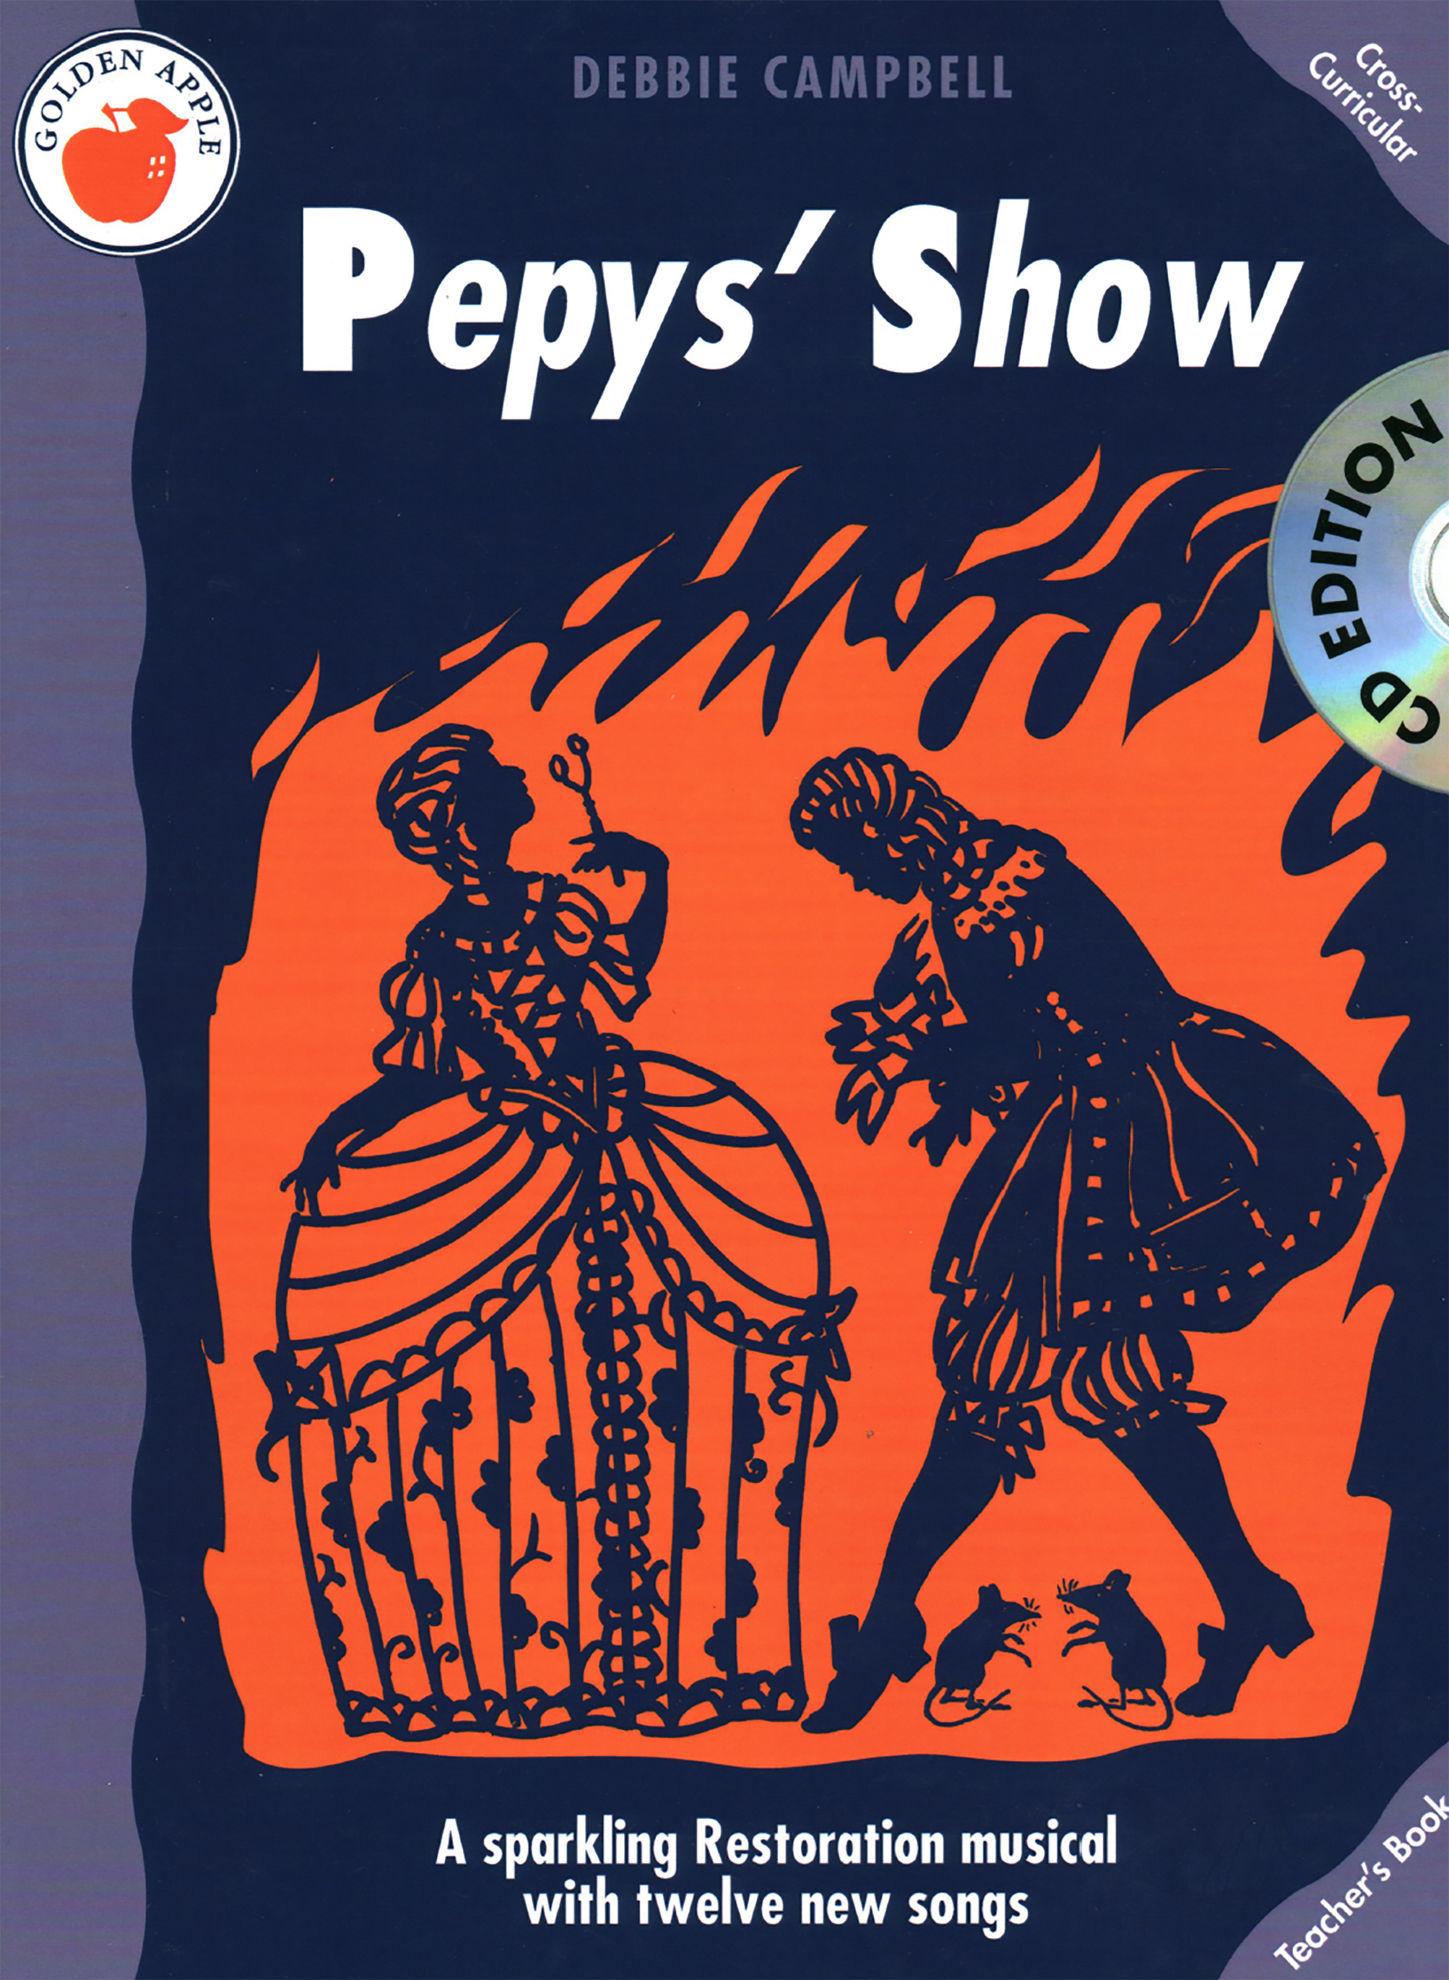 Pepys' Show